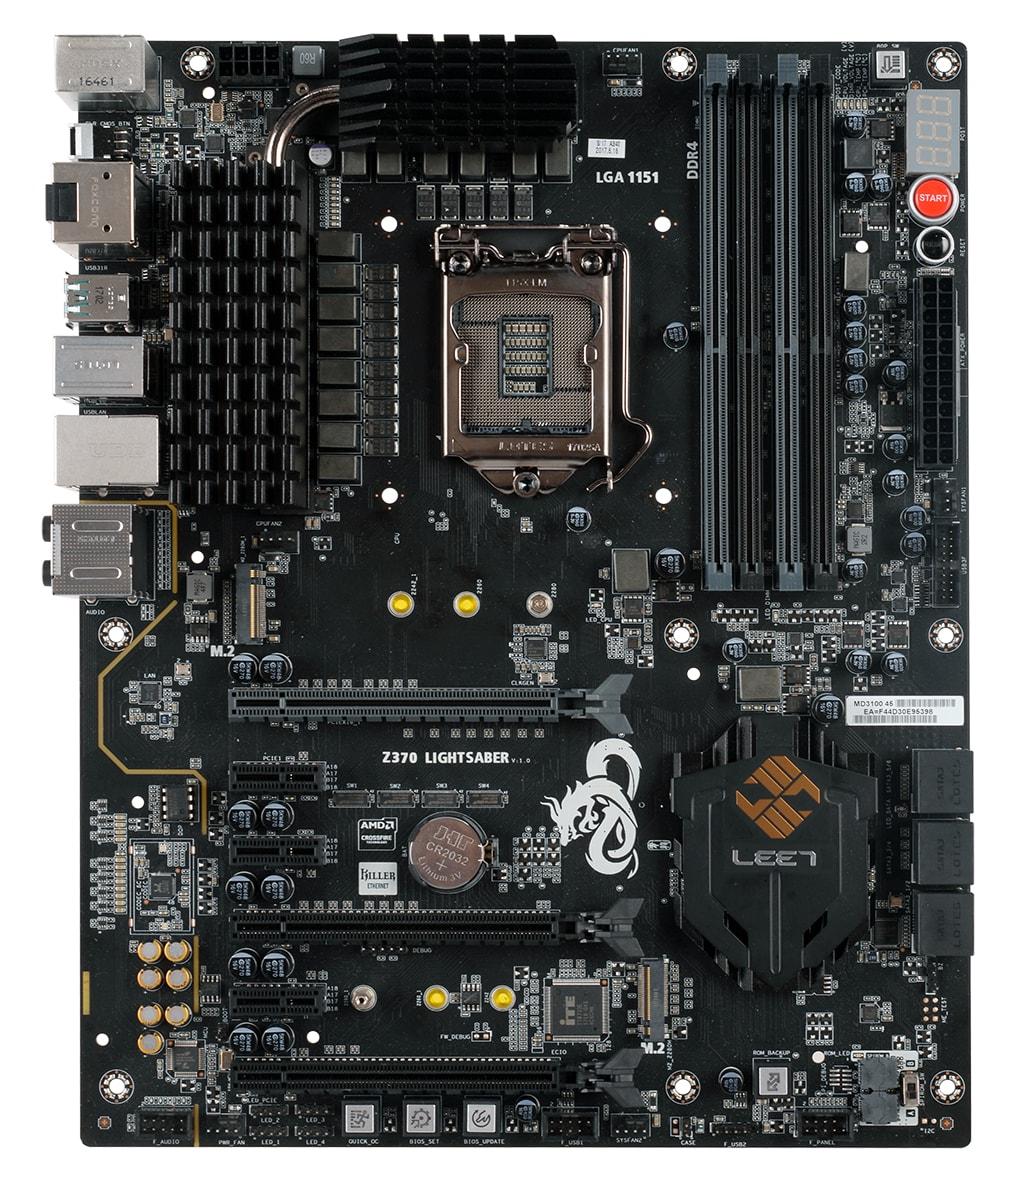 z370 lightsaber 1 0  m2hdf - ECS presenta la nuova motherboard per piattaforma Intel Cofee Lake Z370 Lightsaber